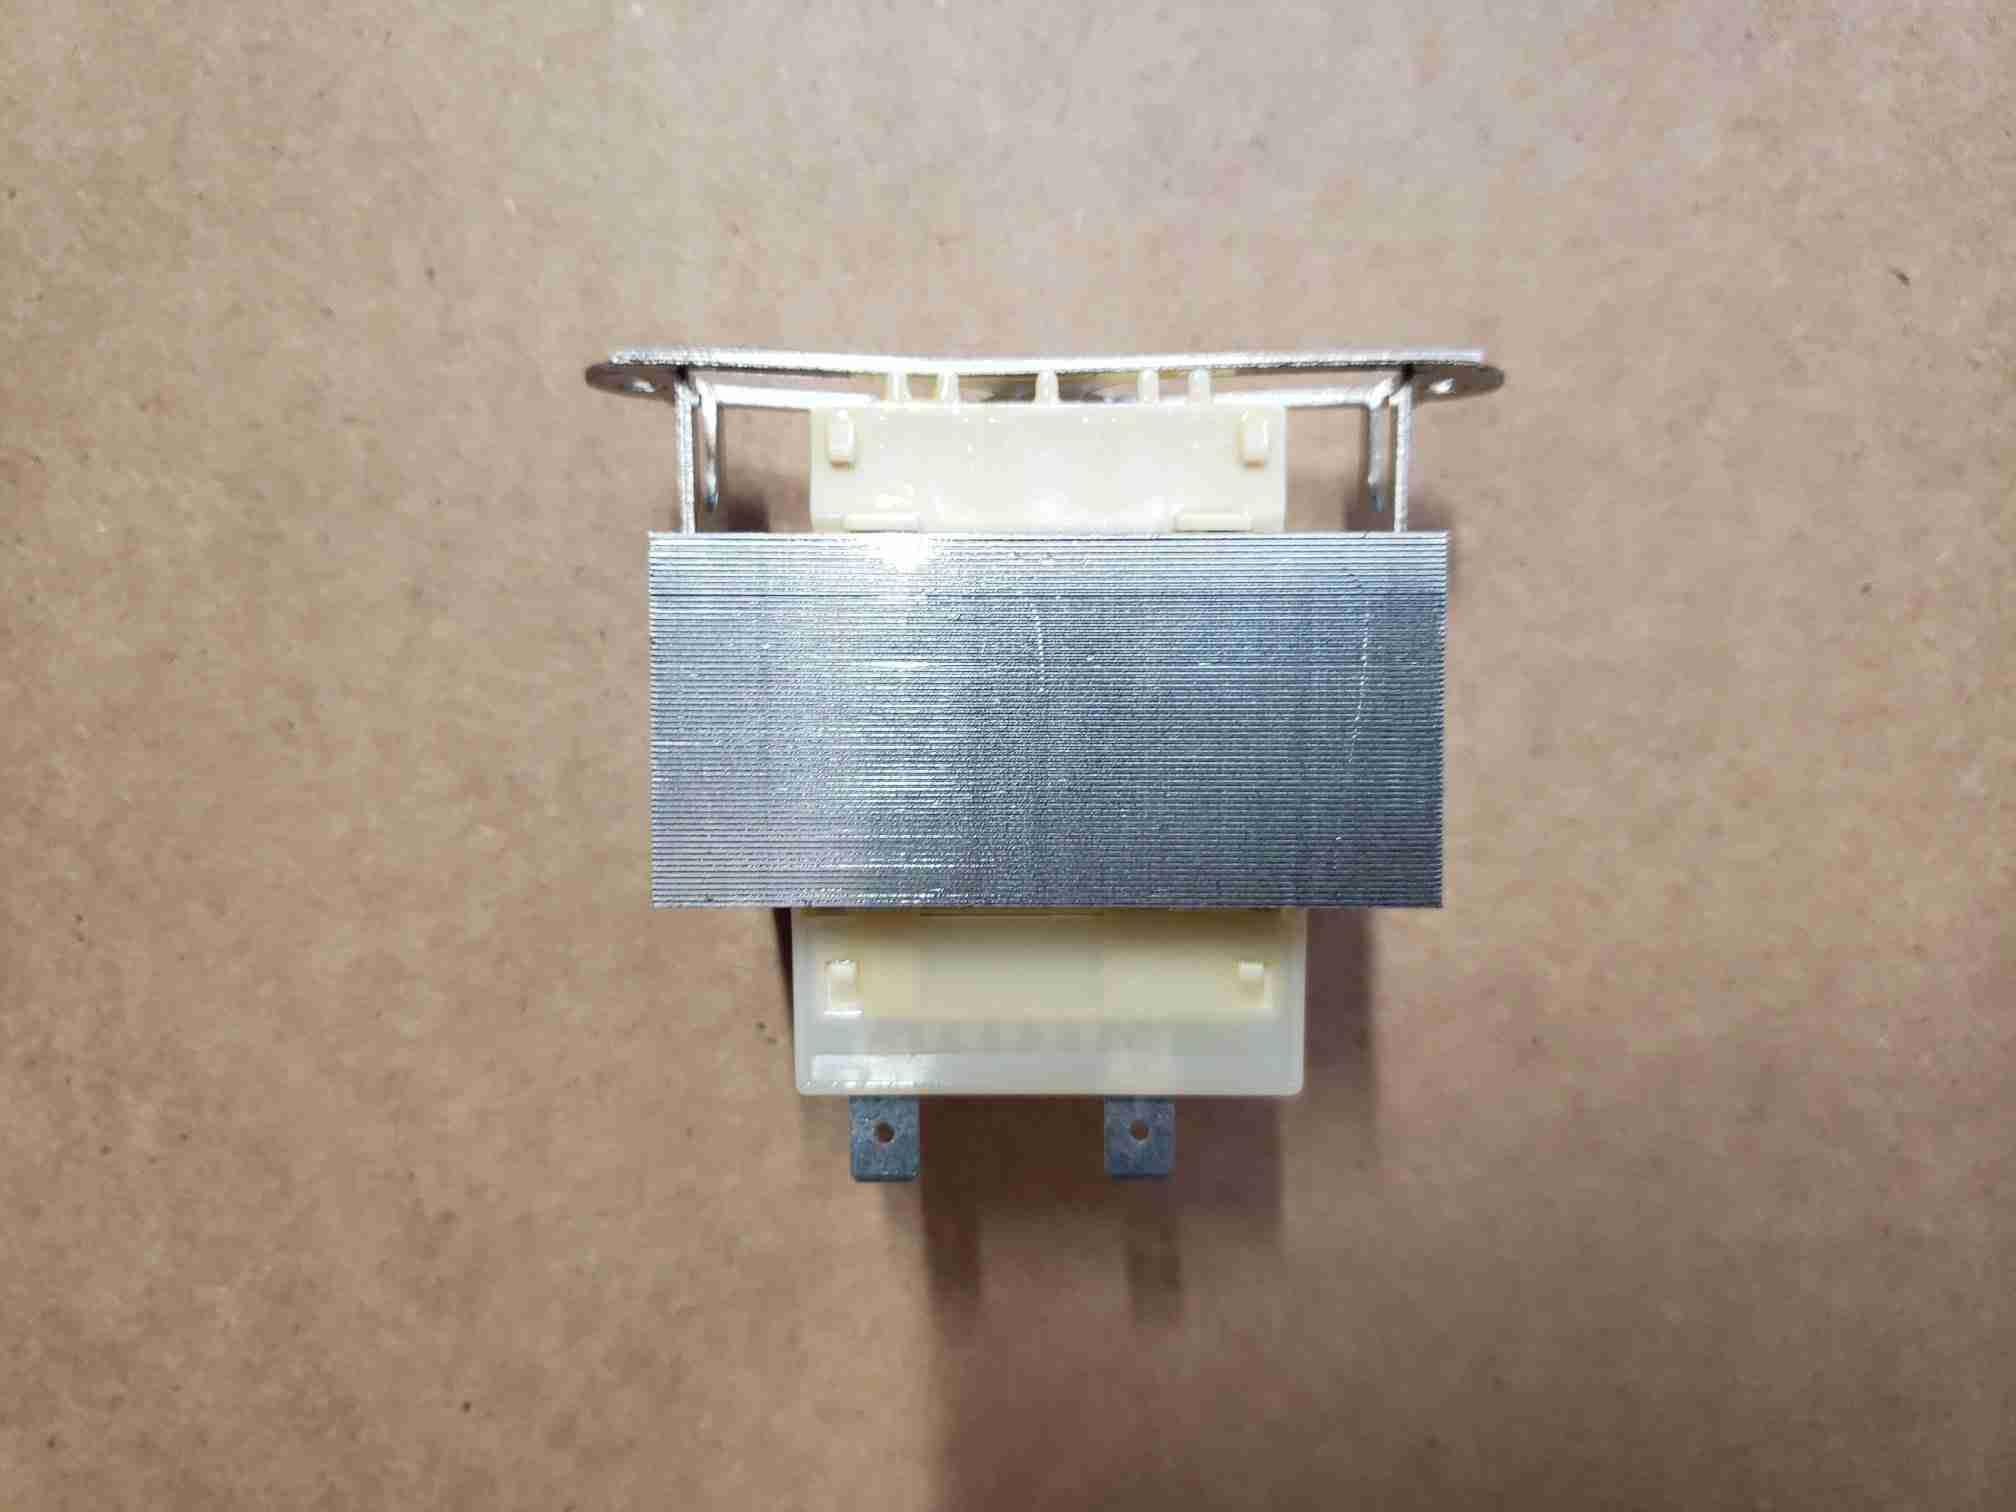 Side view of Transformer for Heat Pump Display Retrofit Kit